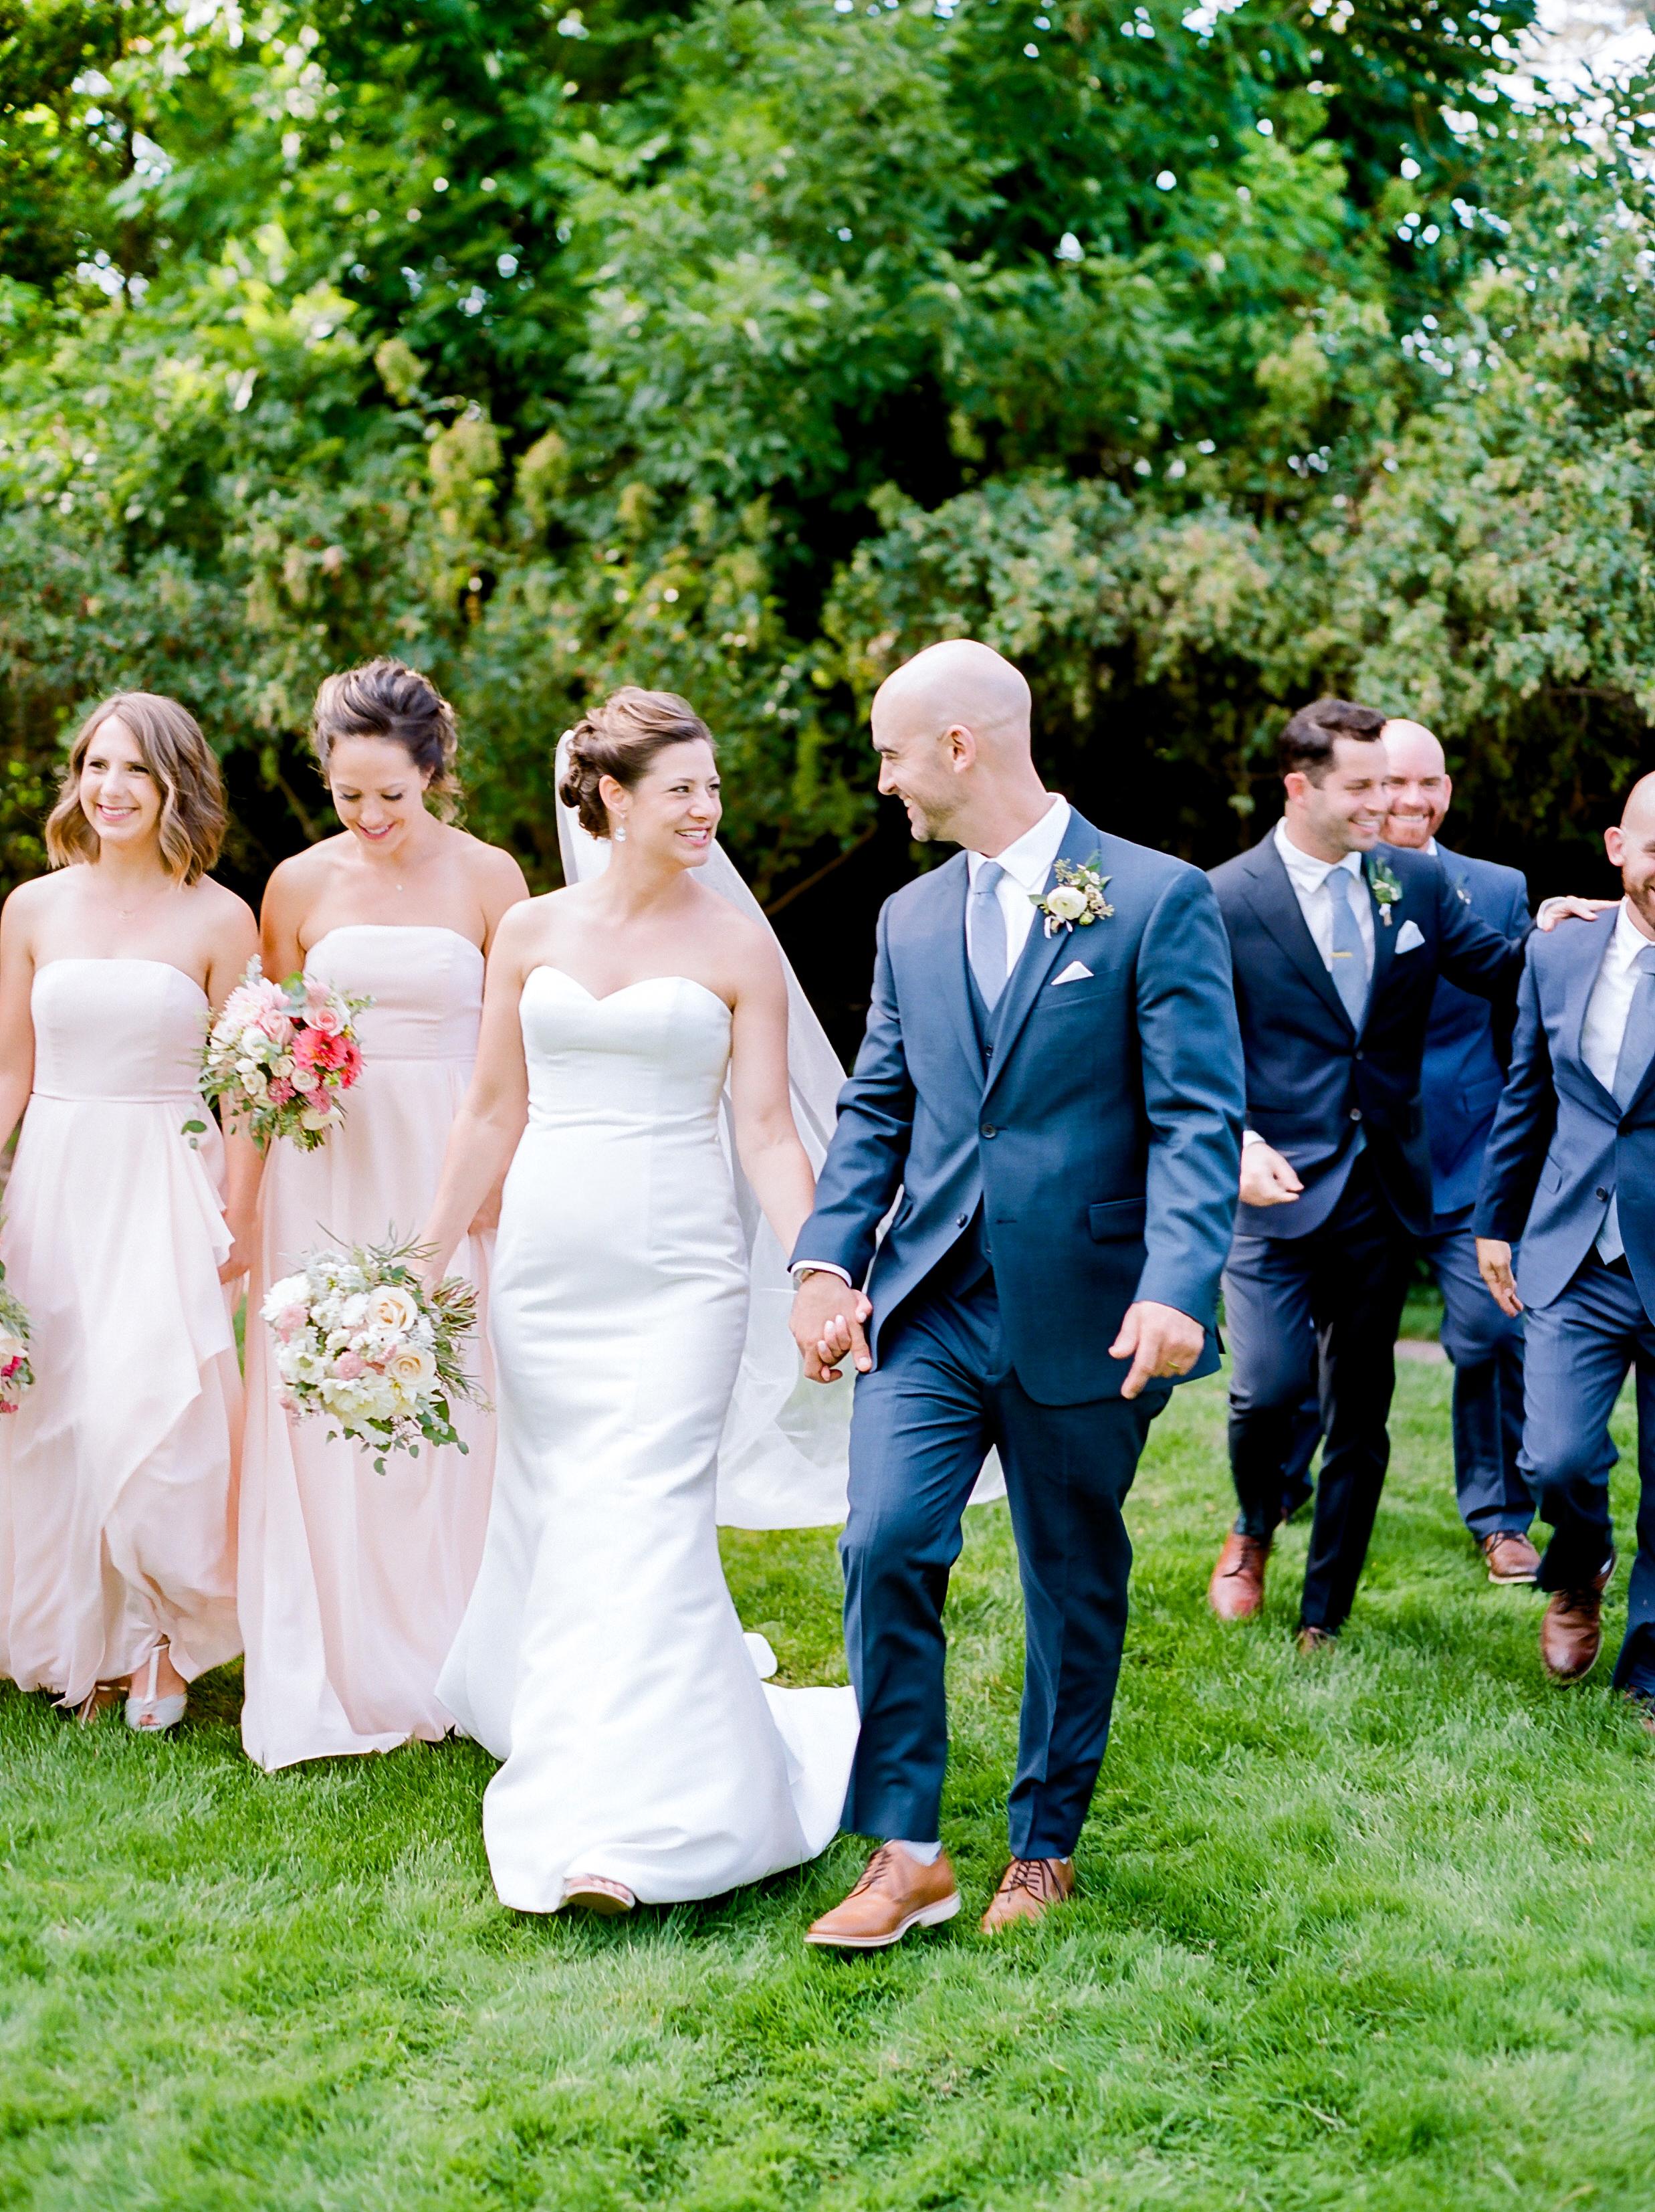 Spokane Wedding at the Bozarth Mansion